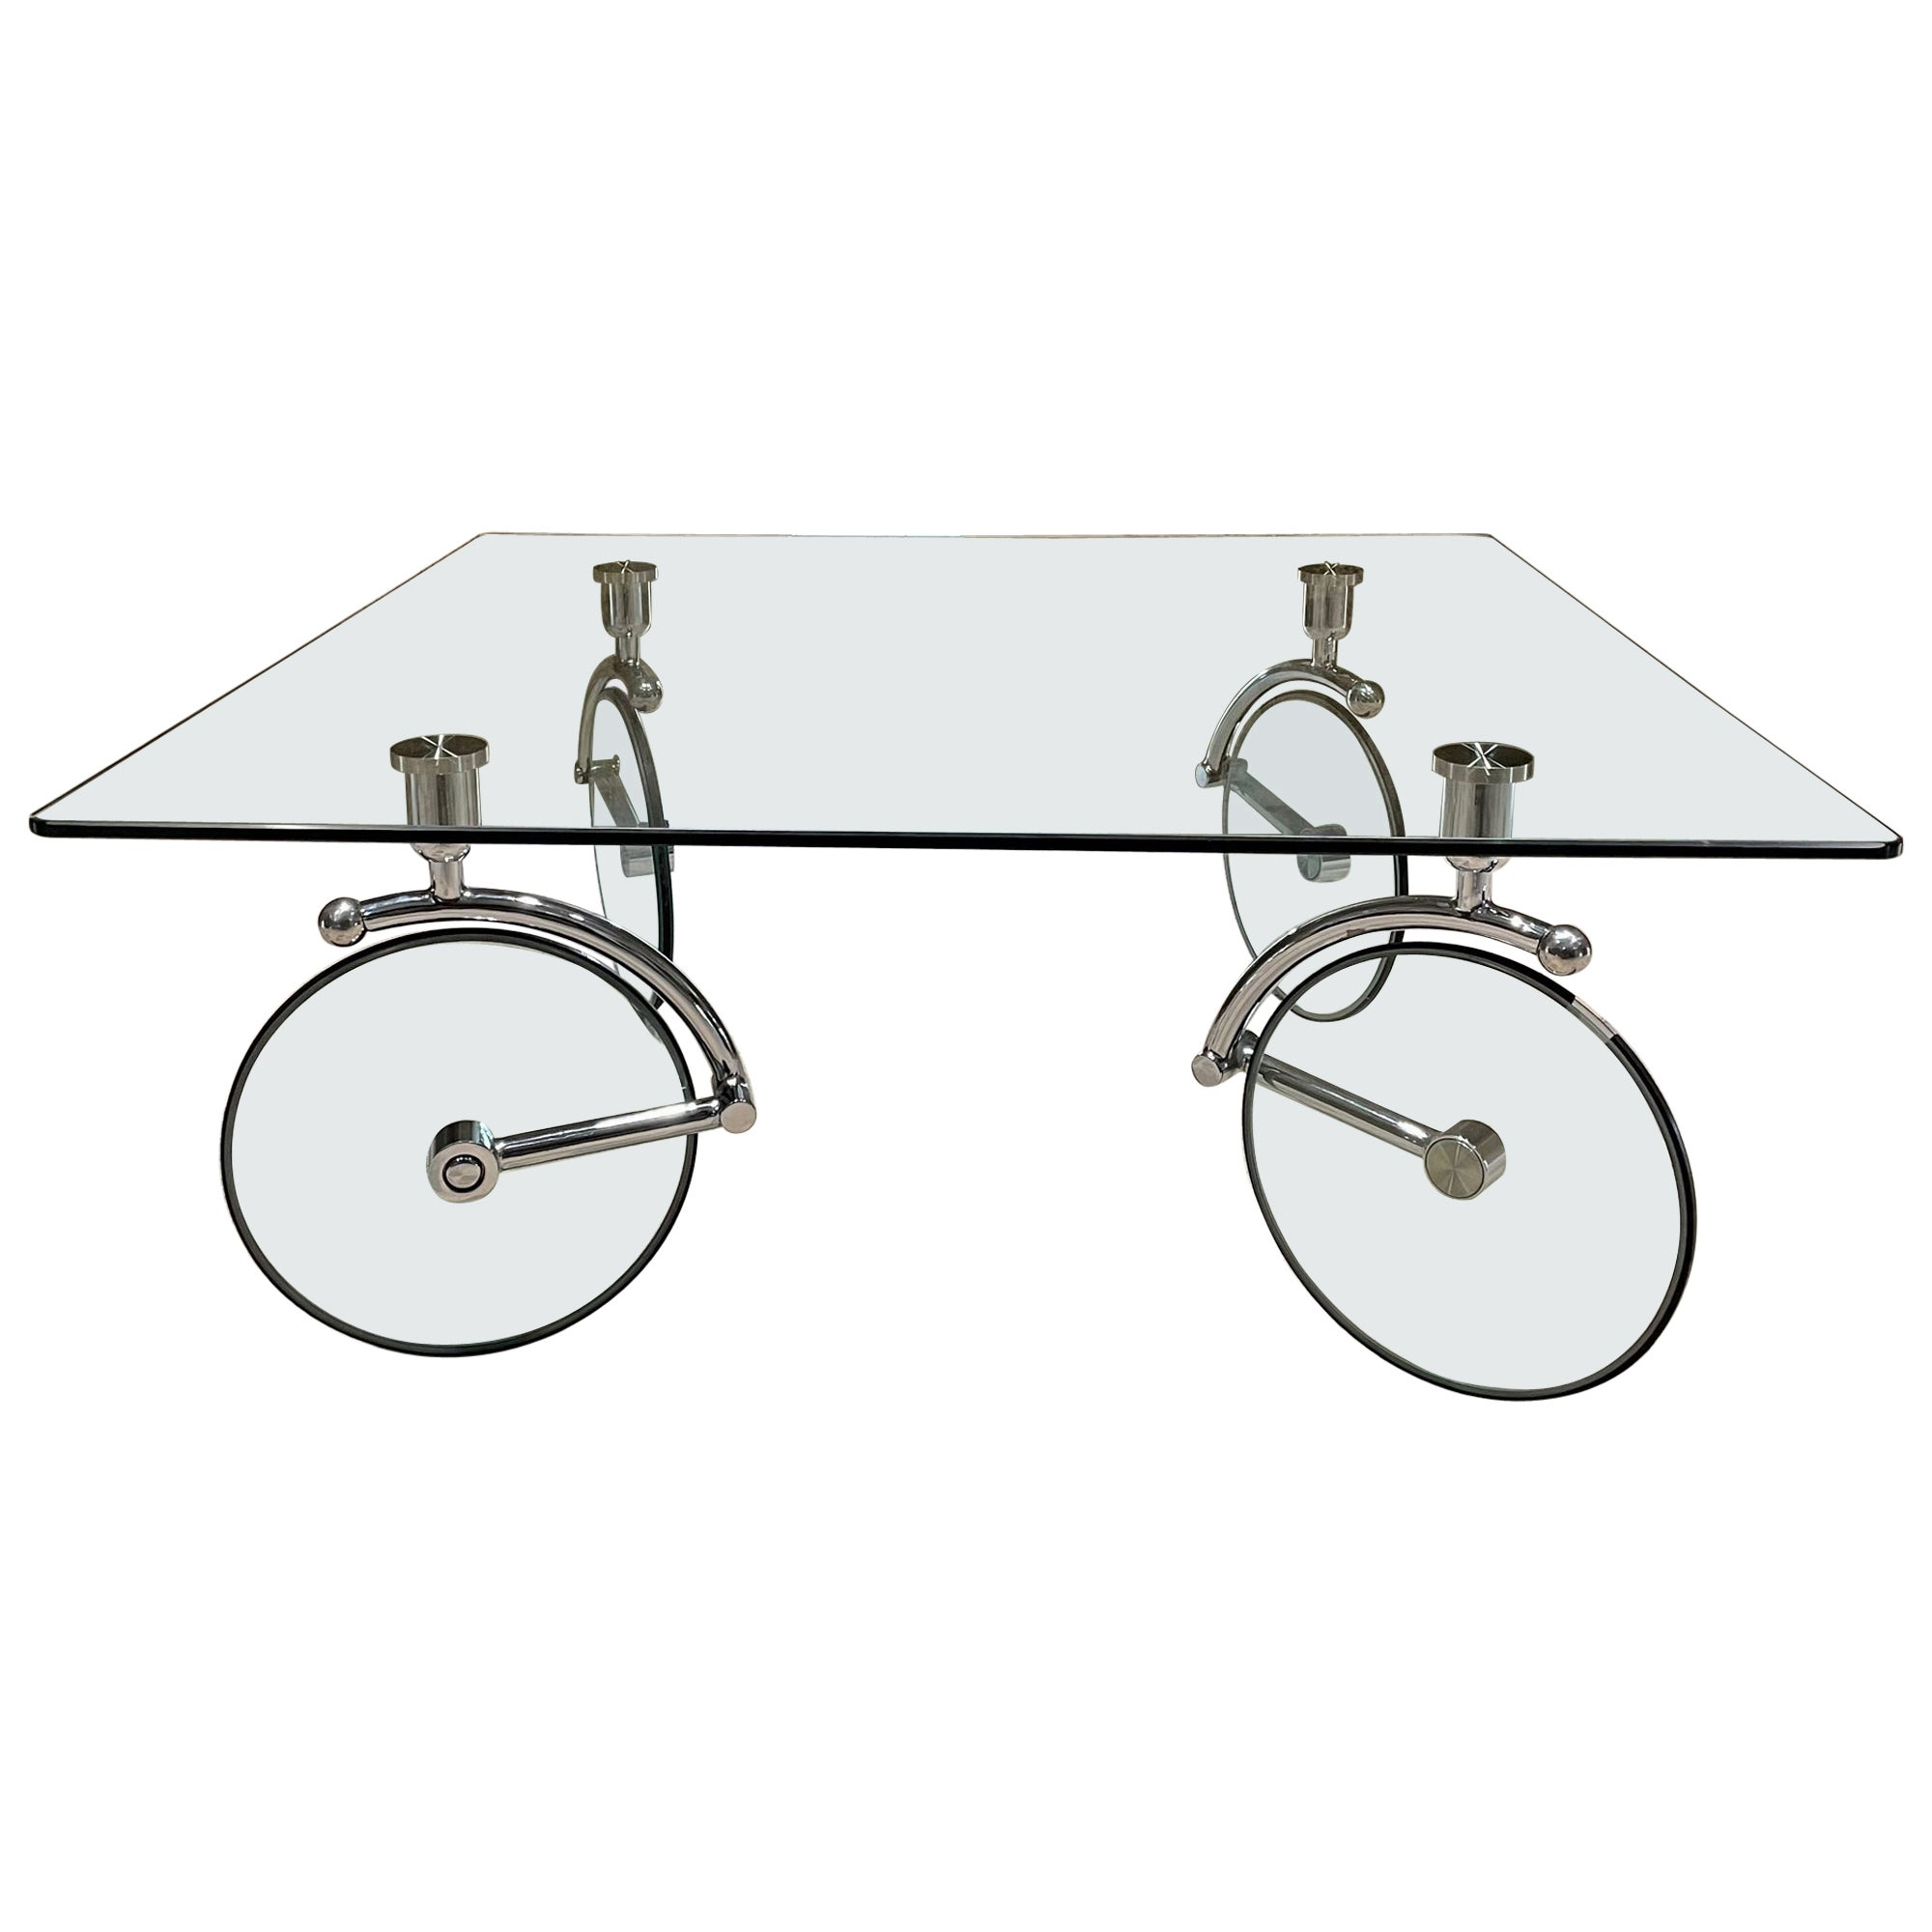 Bicycle Tour Glass Square Coffee Table on Wheels Gae Aulenti Fontana Arte Italy